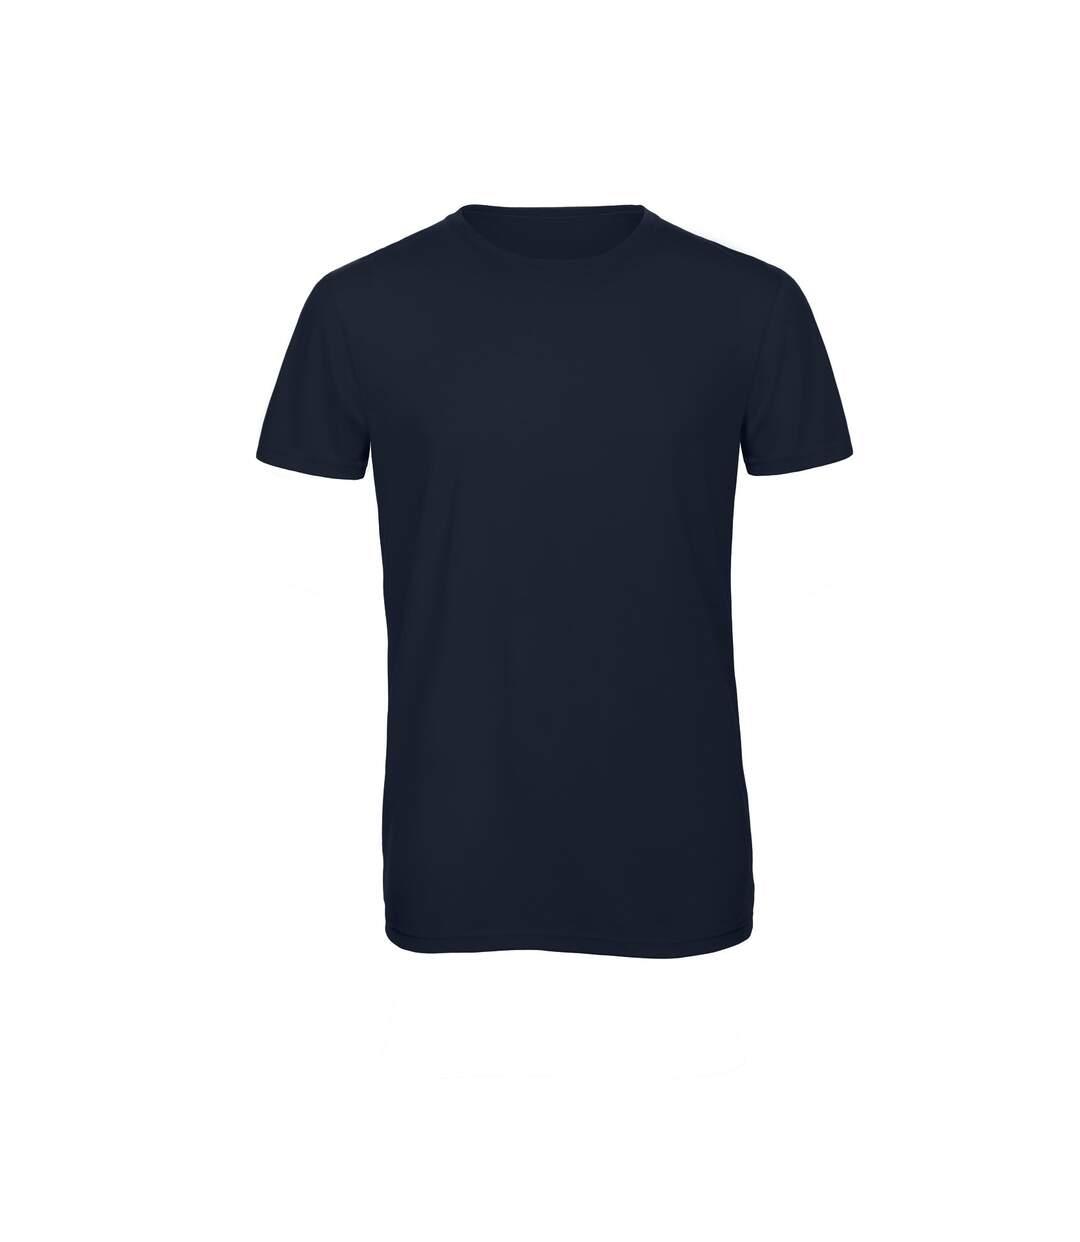 B&C Mens Favourite Short Sleeve Triblend T-Shirt (Navy Blue) - UTBC3638